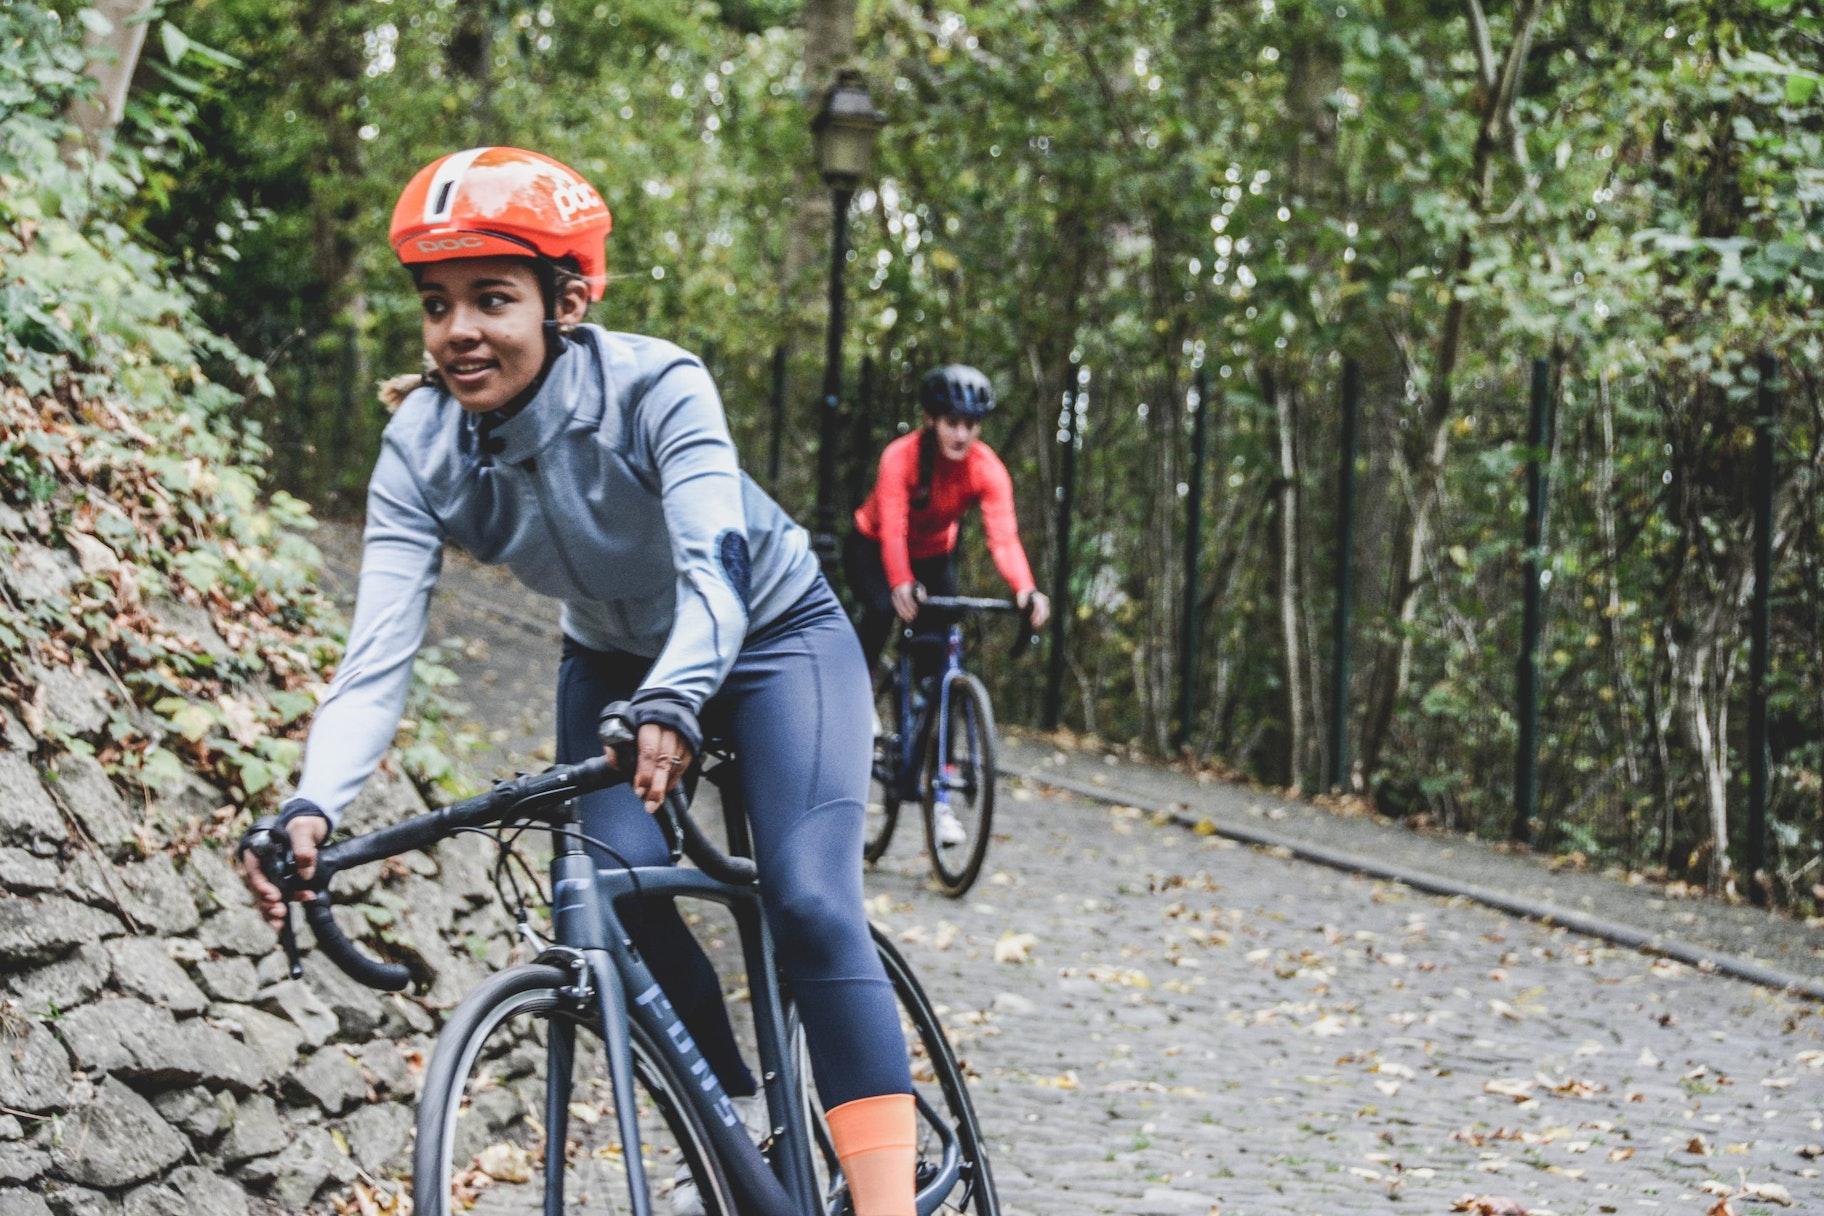 Dicas Drop: acessórios de ciclismo